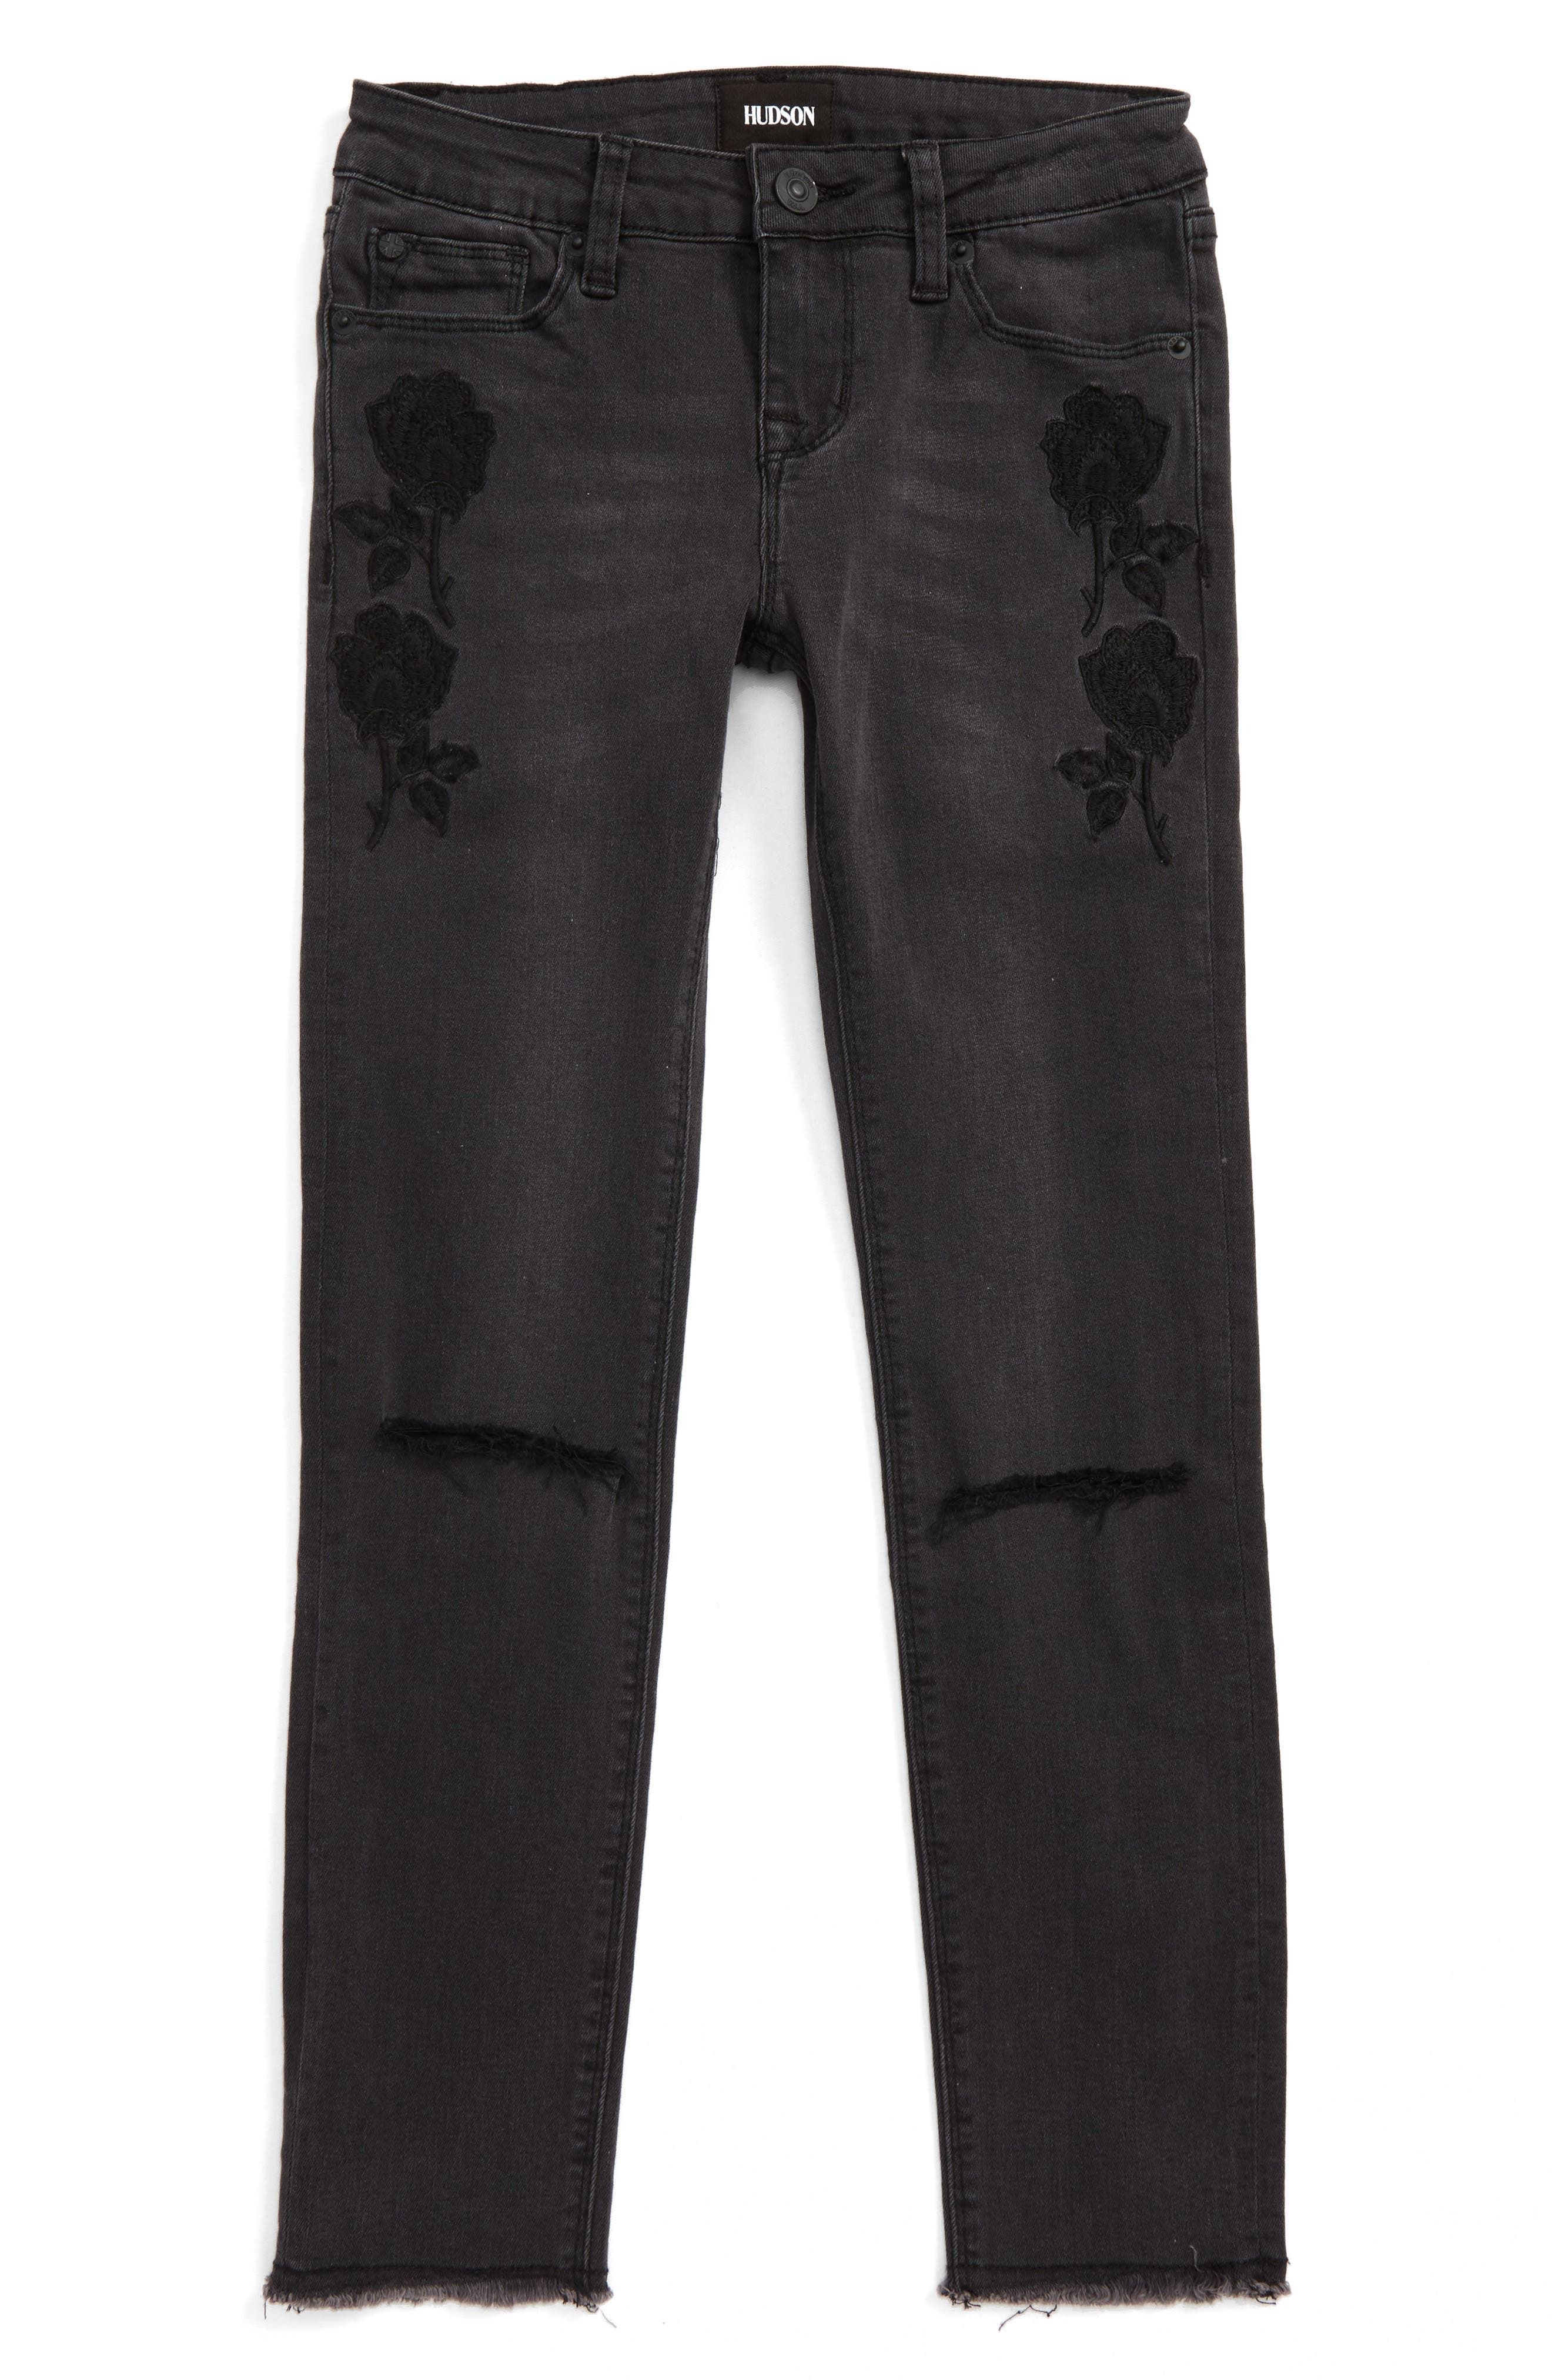 Black Iris Skinny Jeans,                         Main,                         color, 008